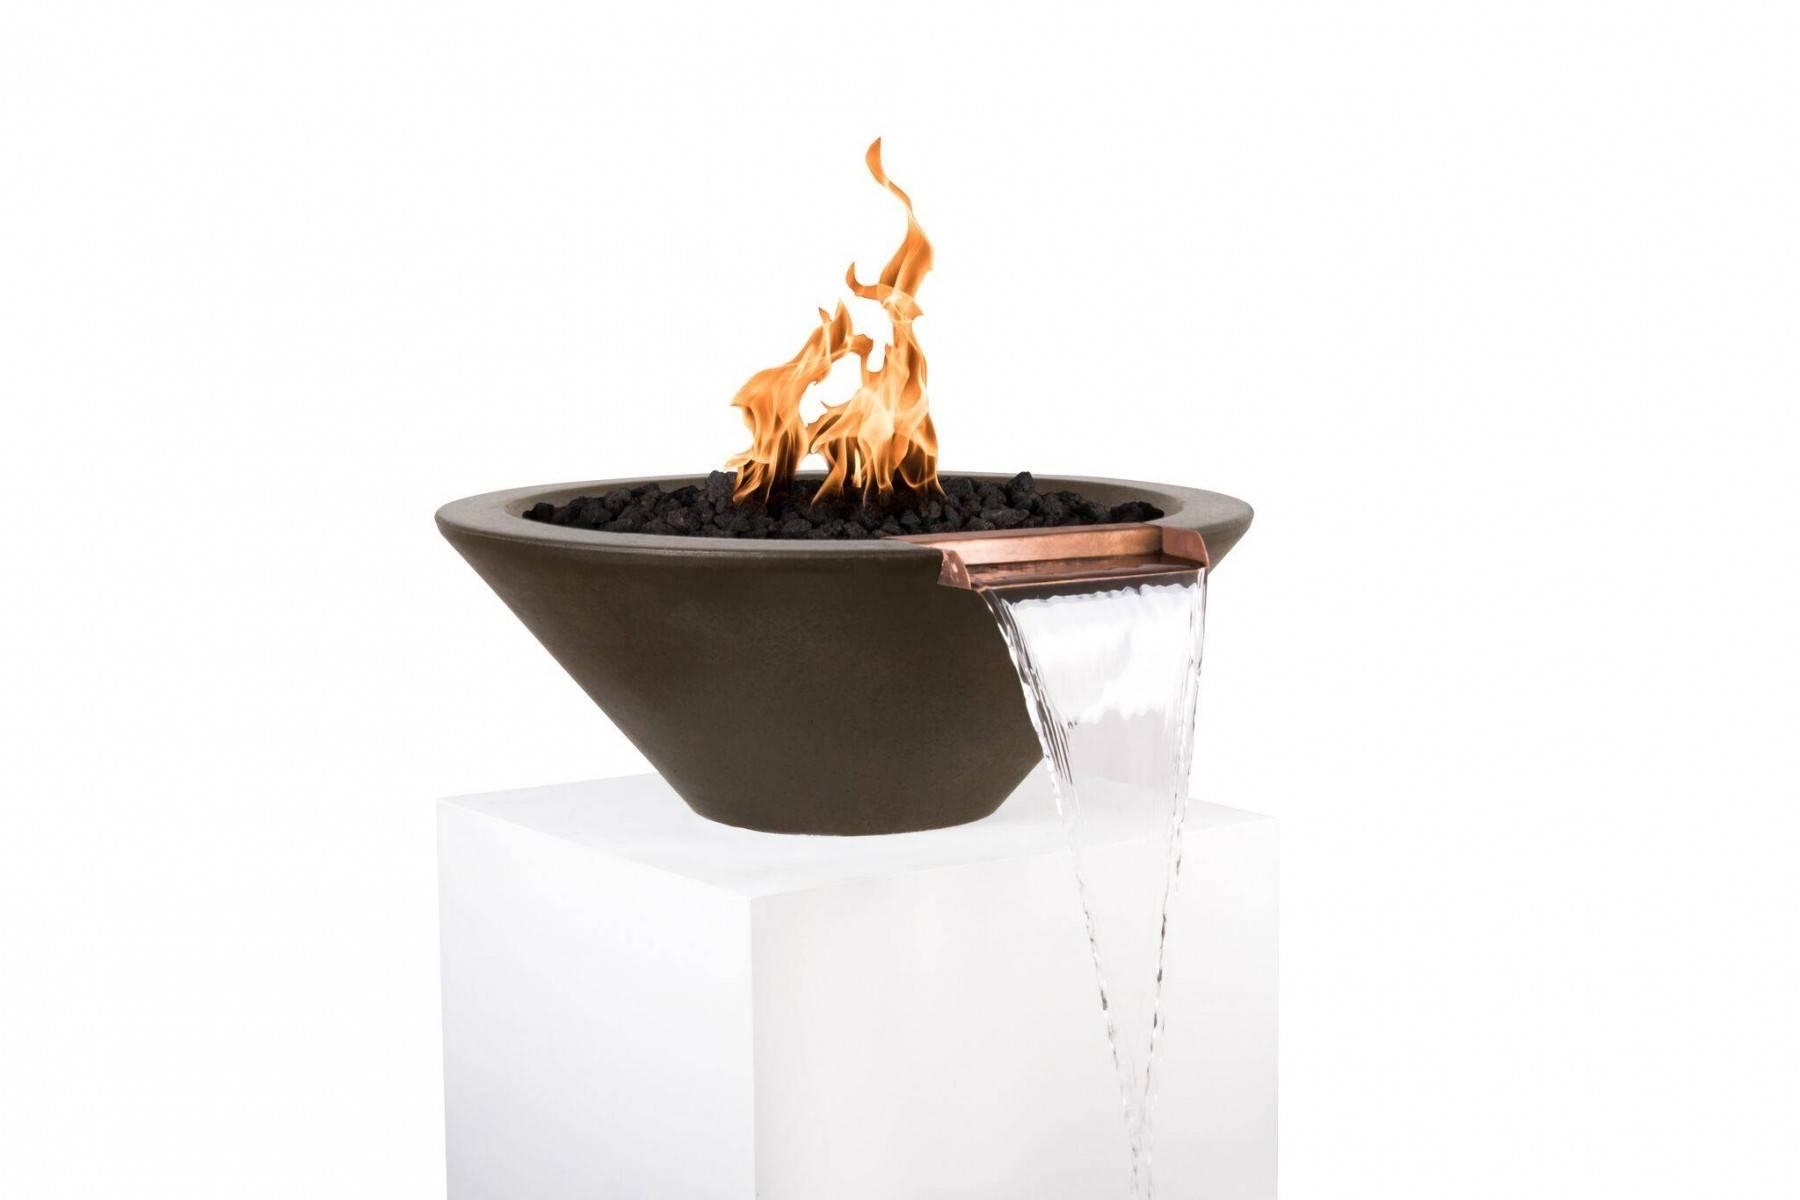 31 pool fire bowl wok gfrc pool fire bowls round pool for Pool fire bowls